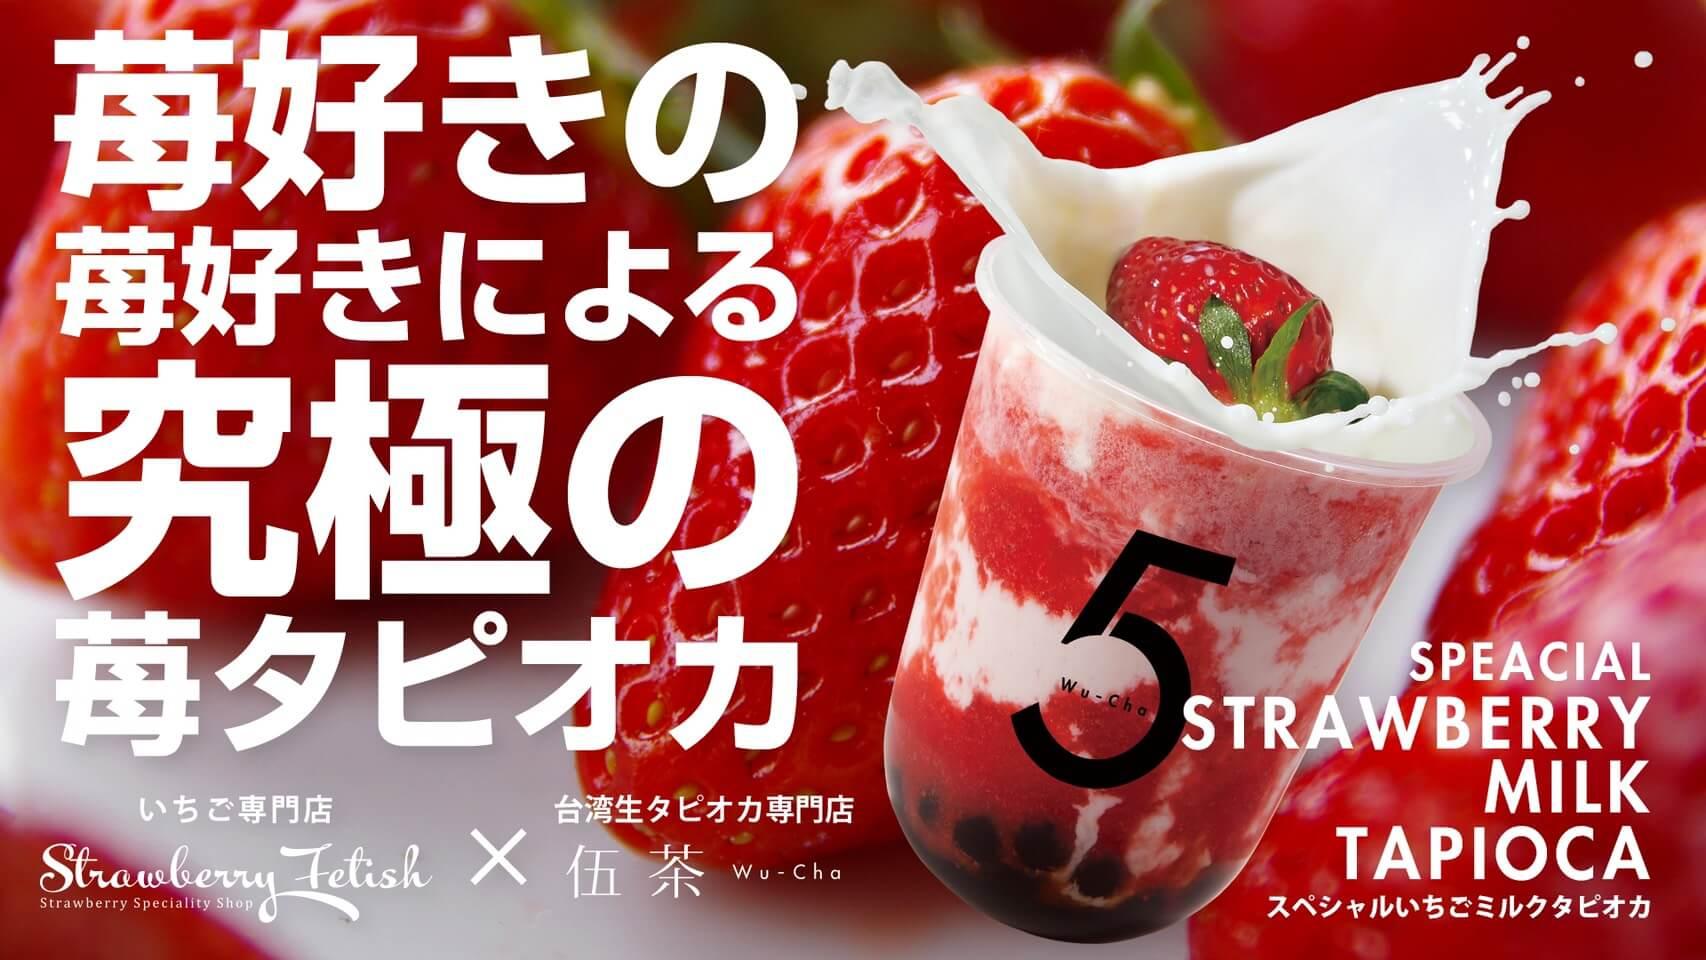 strawberry-fetish%ef%bc%88%e3%82%b9%e3%83%88%e3%83%ad%e3%83%98%e3%82%99%e3%83%aa%e3%83%bc-%e3%83%95%e3%82%a7%e3%83%81%ef%bc%89%e3%81%84%e3%81%a1%e3%81%93%e3%82%99%e3%81%b5%e3%82%99%e3%81%a8%e3%82%99-2